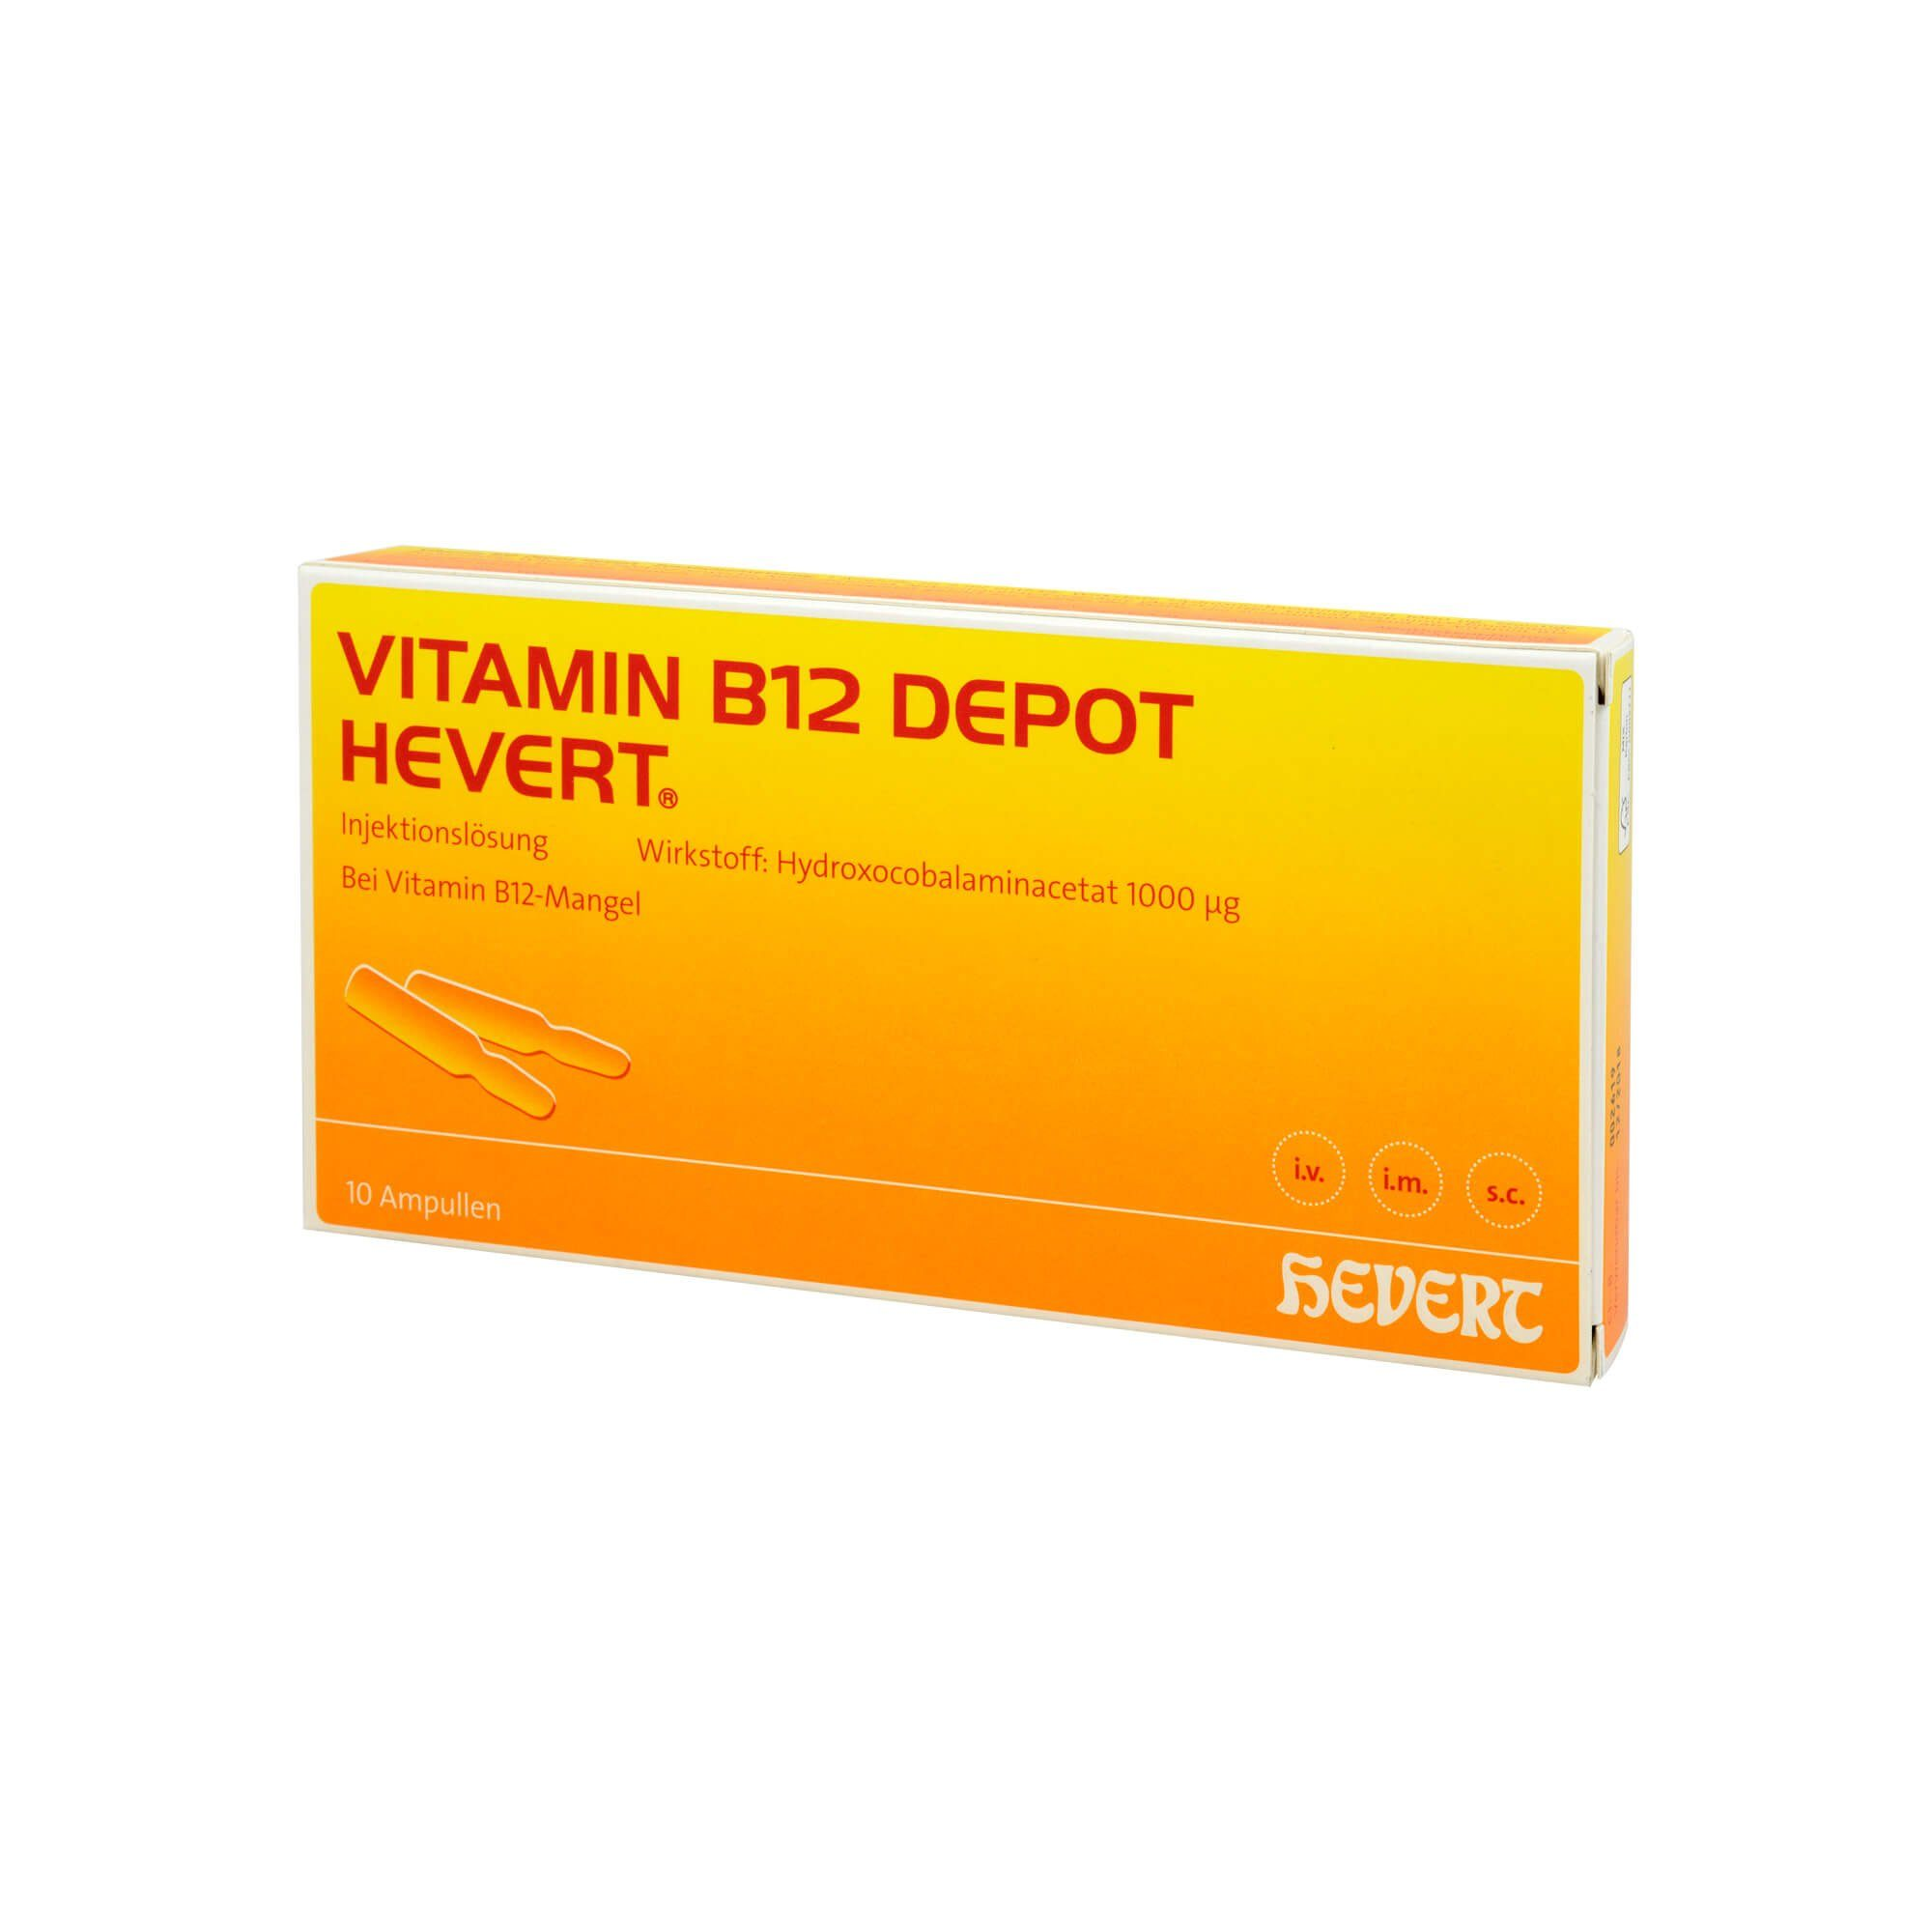 Hevert VITAMIN B12 DEPOT HEVERT , 10 St